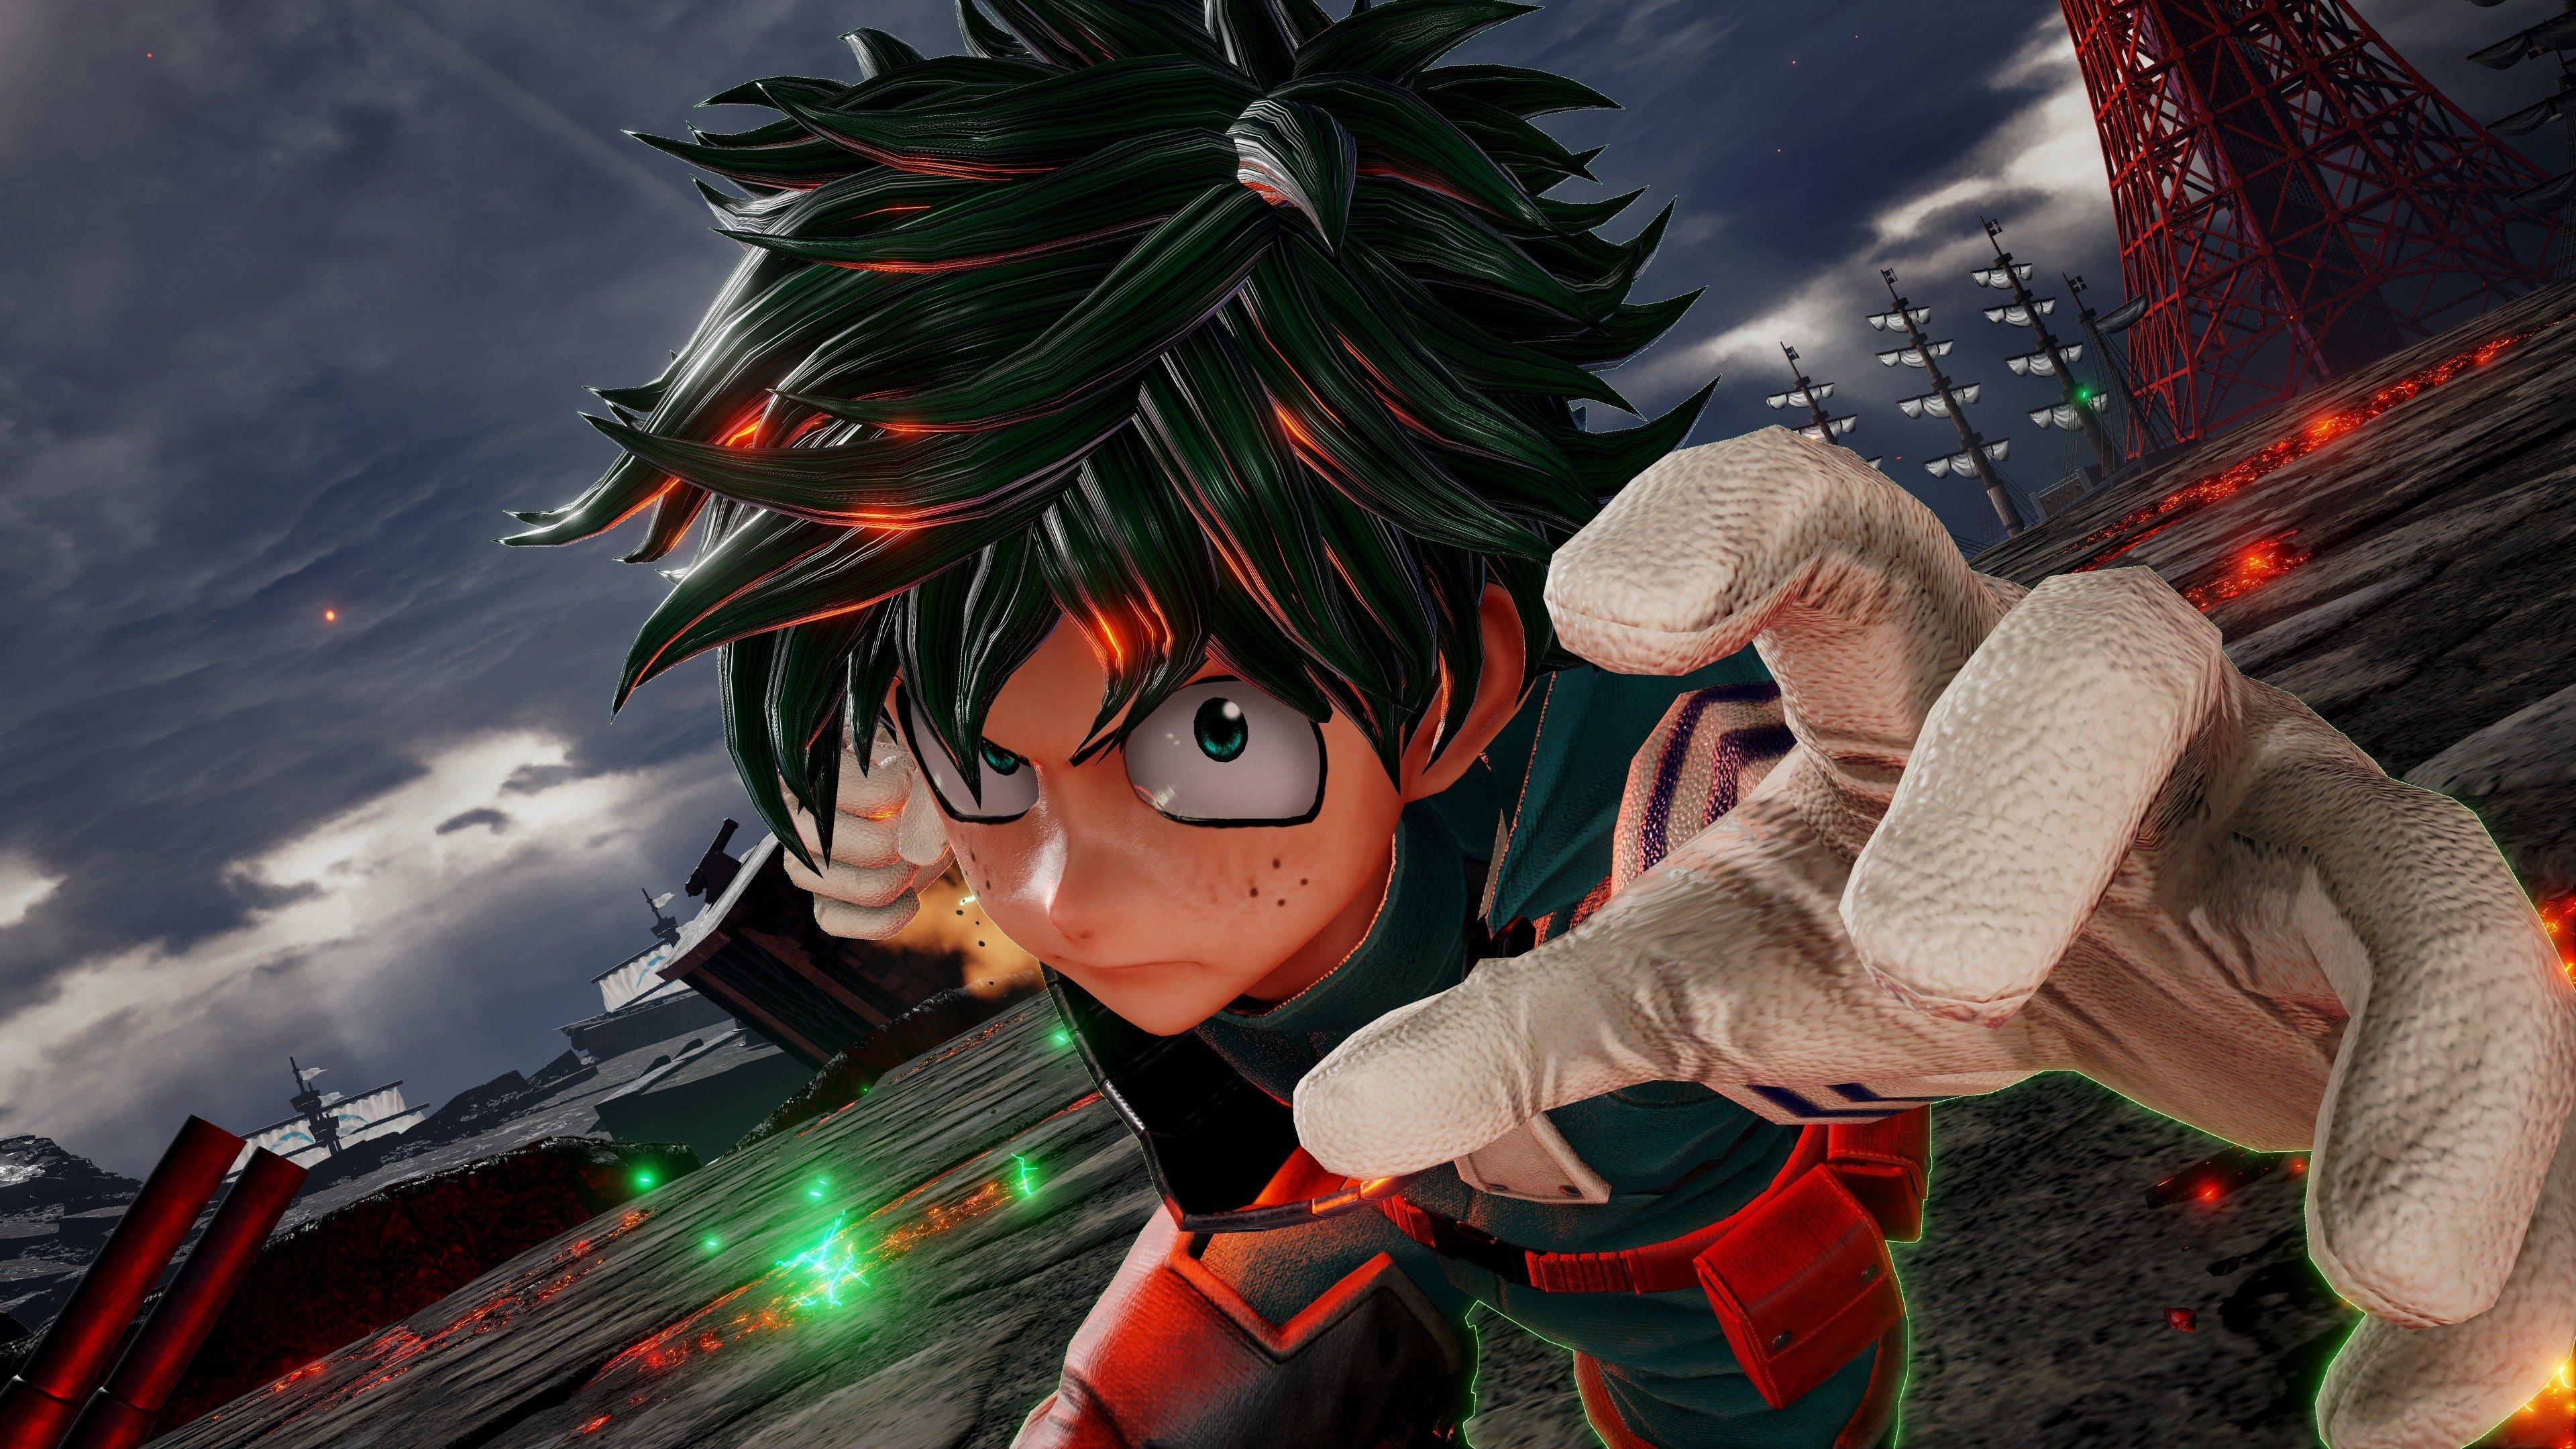 Fondos de pantalla Izuku Midoriya de My Hero Academia en Jump Force